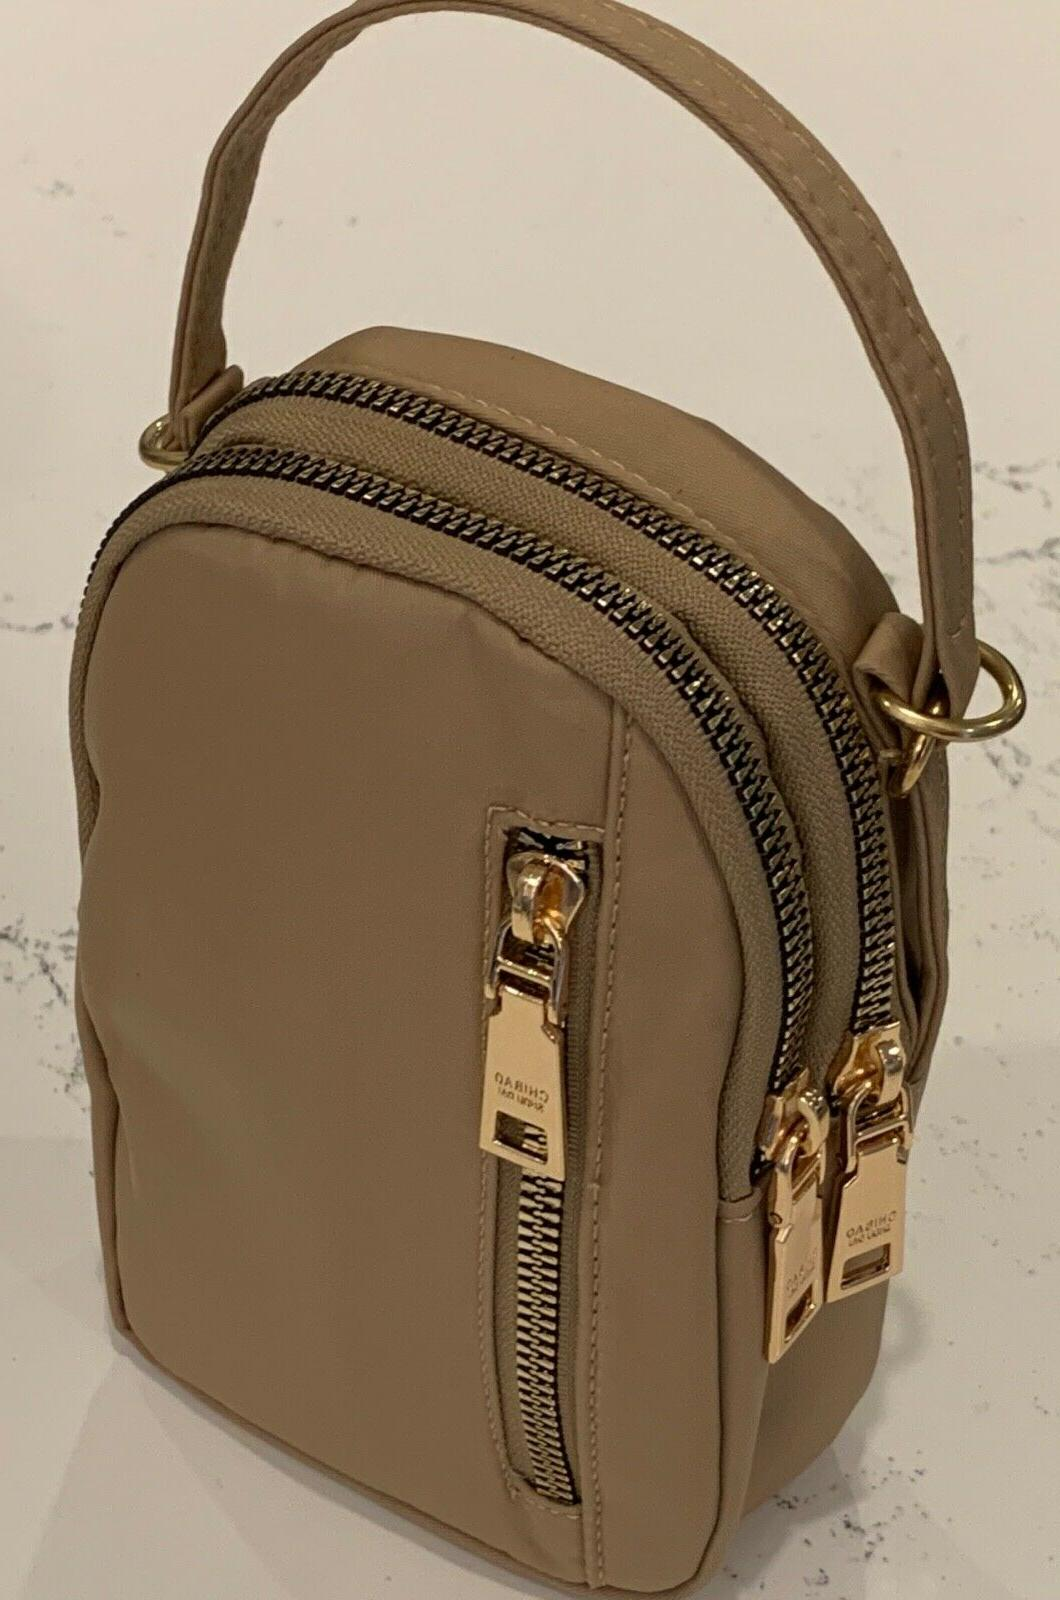 NEW Lightweight Crossbody Bag Purse